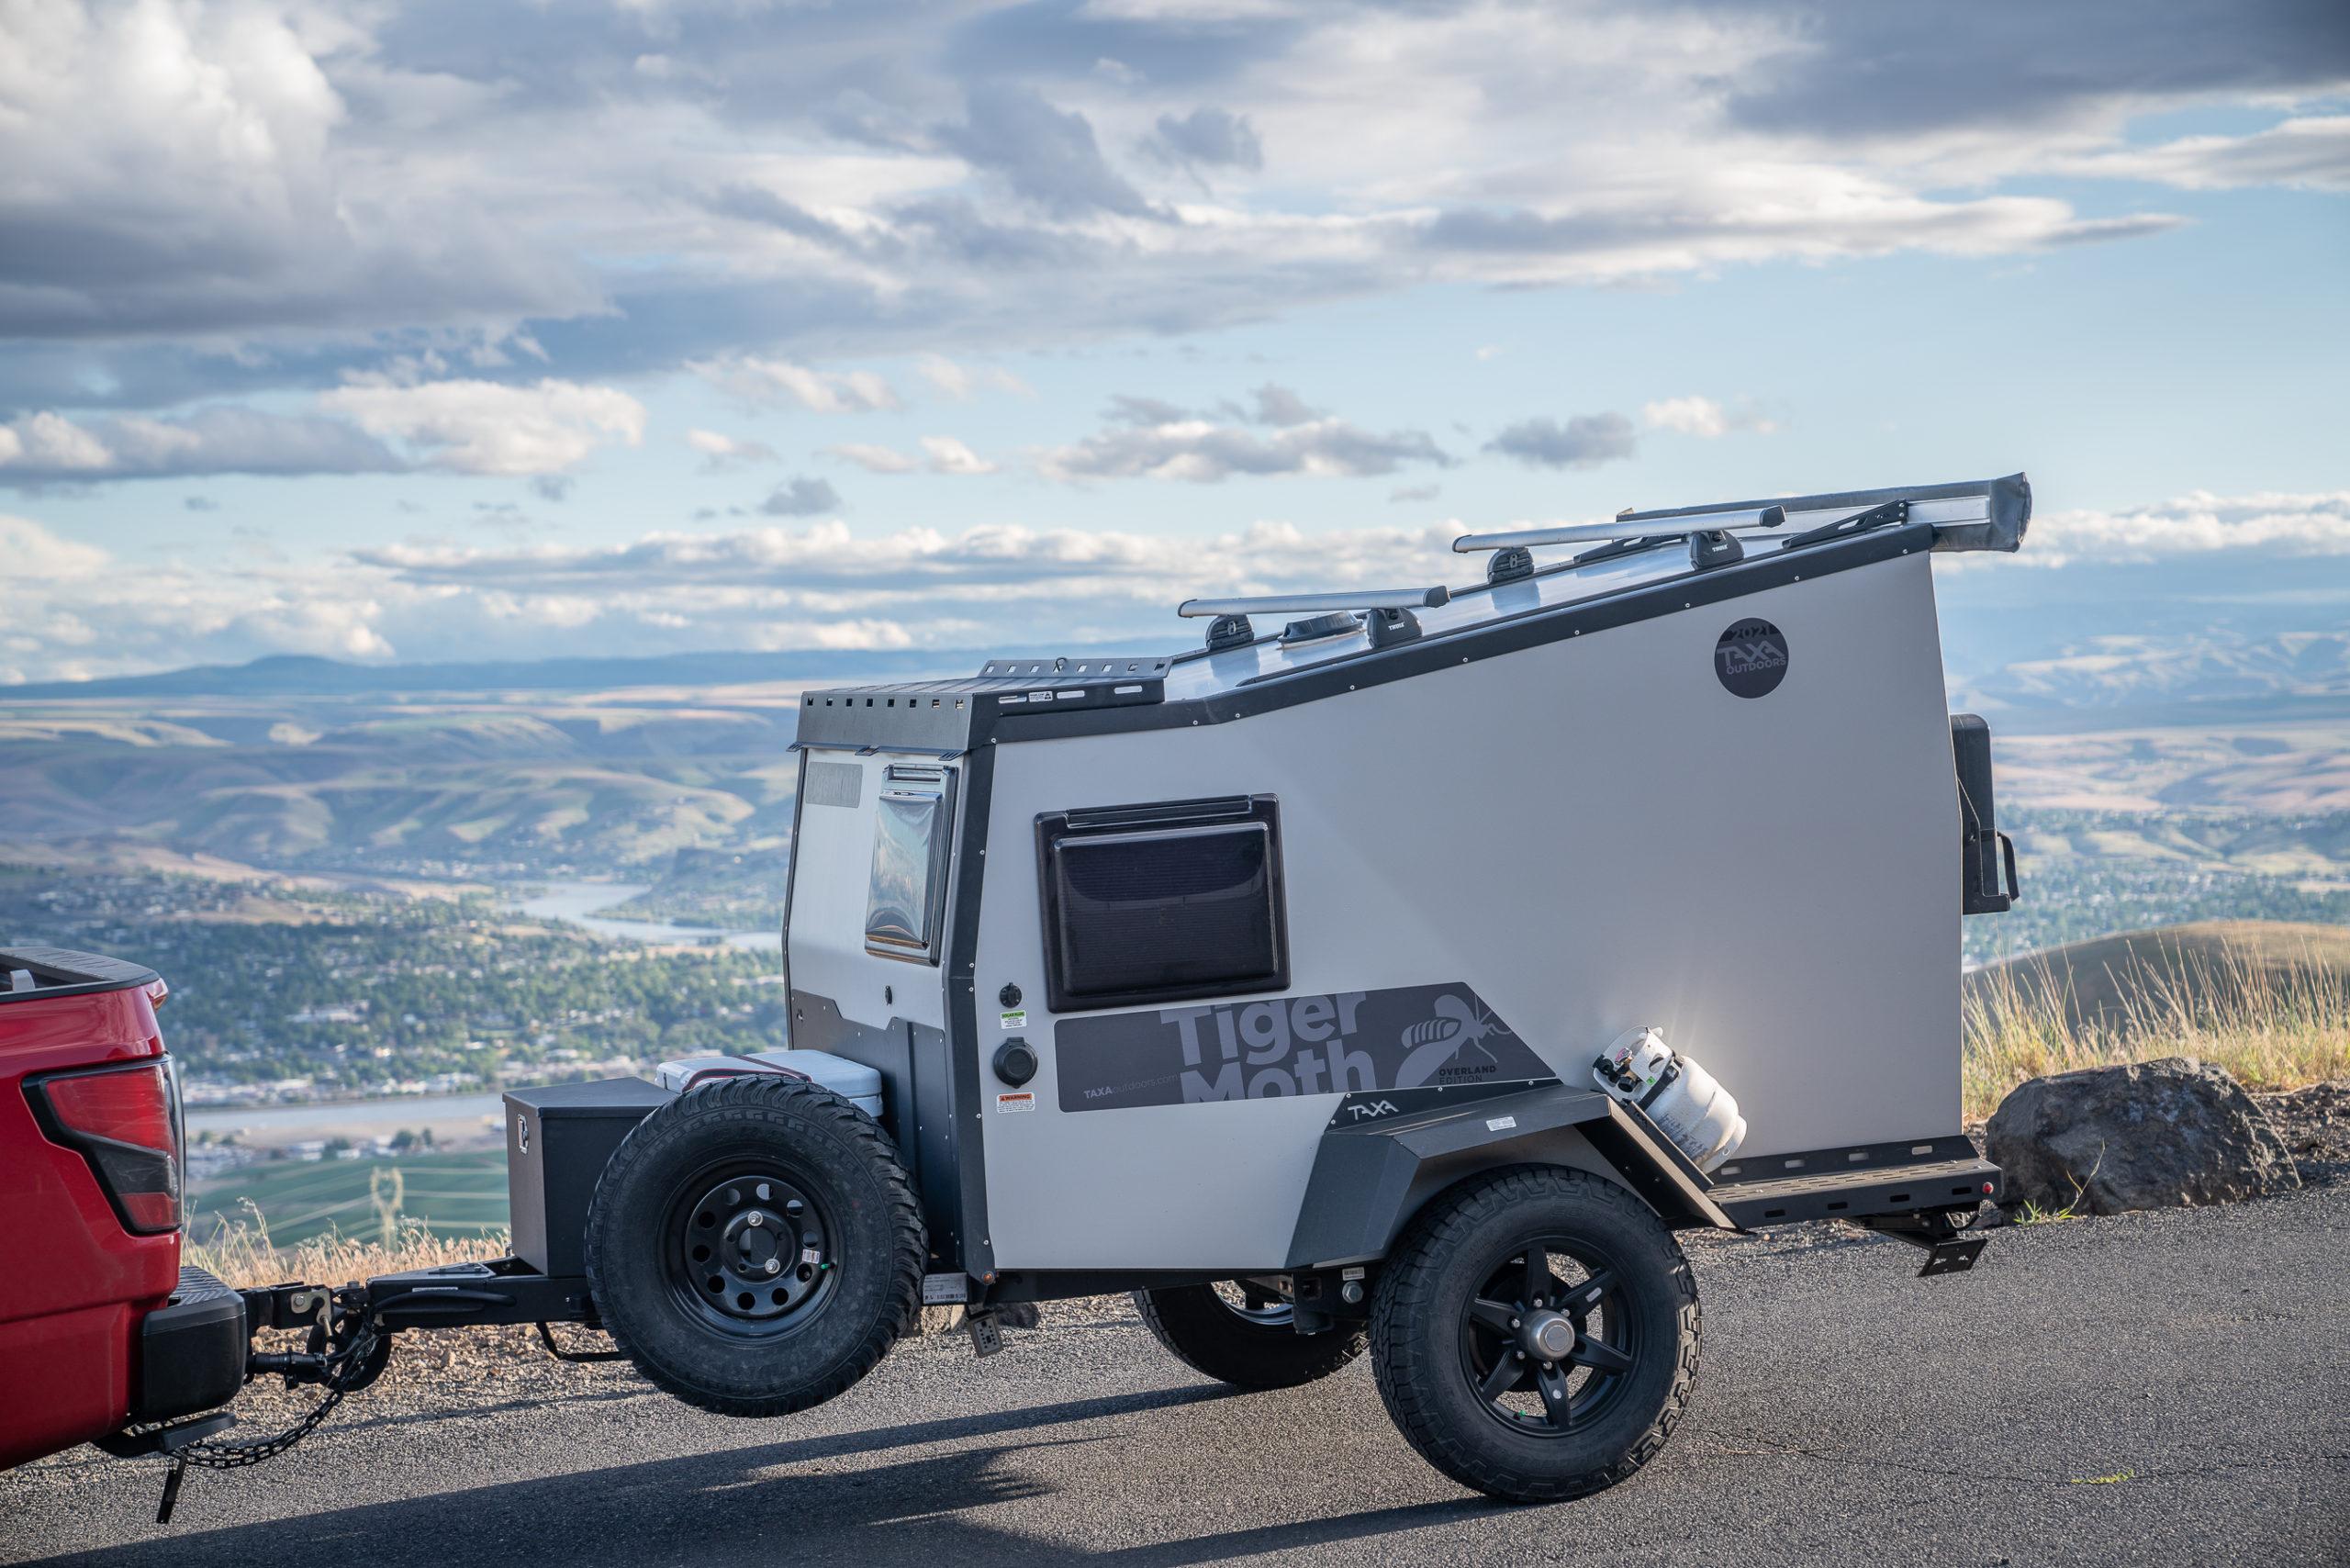 2021 Taxa Outdoors TigerMoth Overland exterior side view